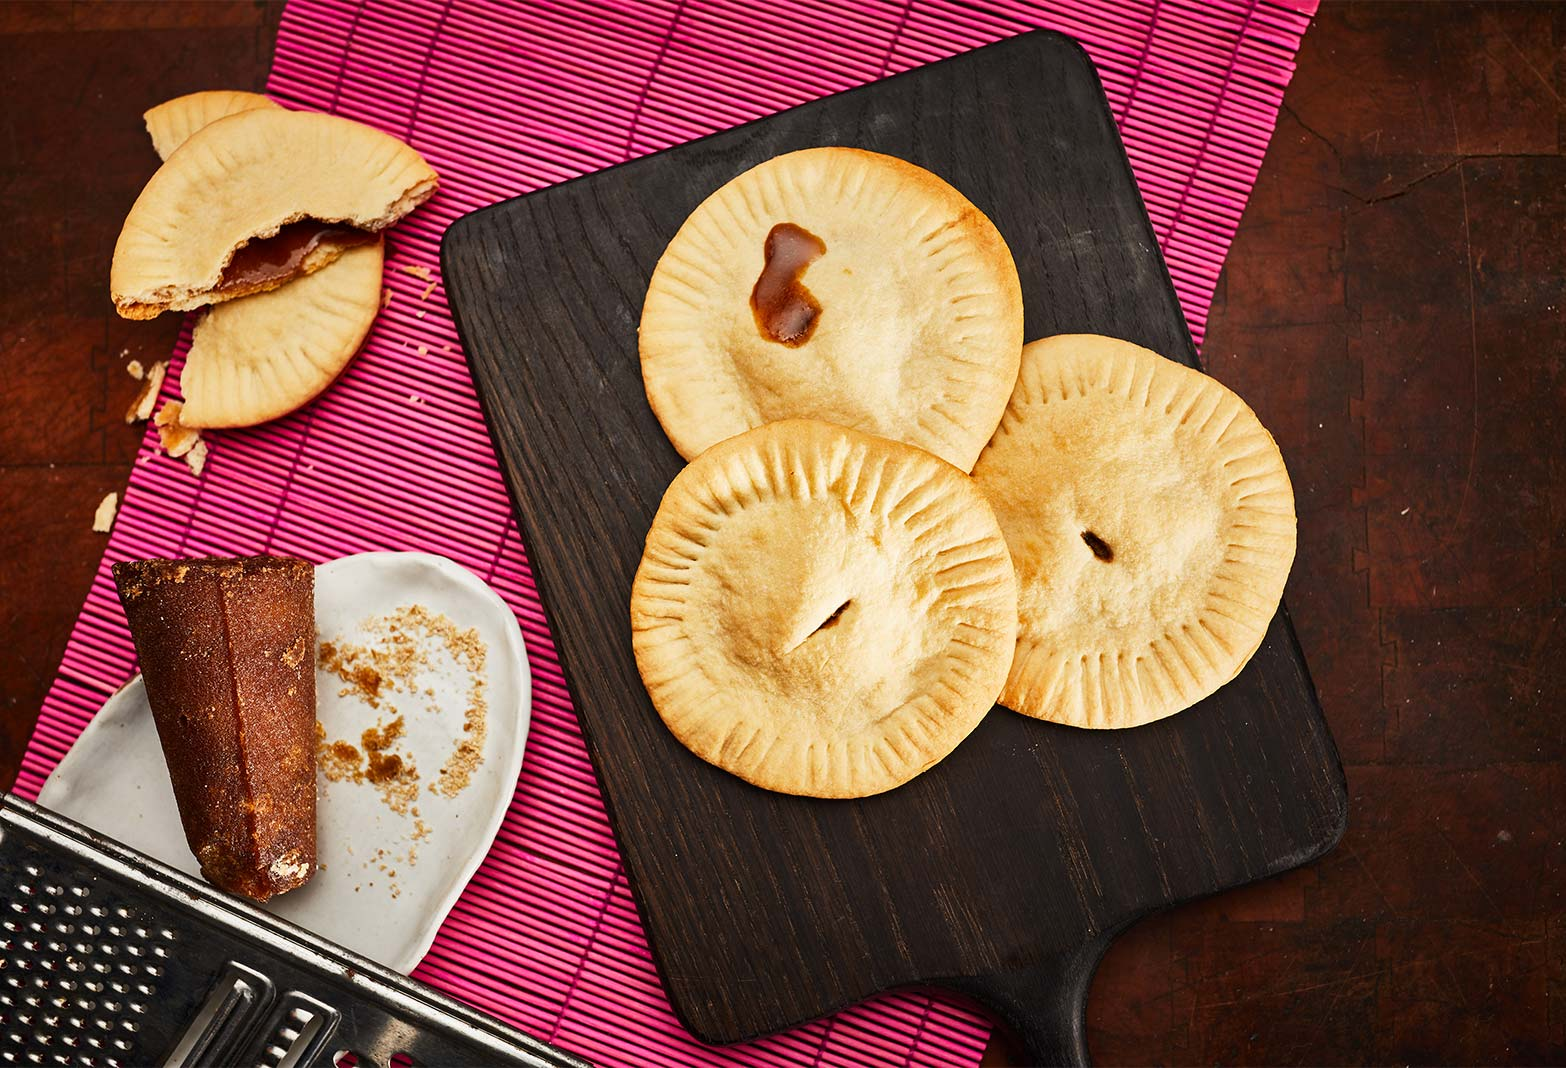 flaky round empanadas with piloncillo